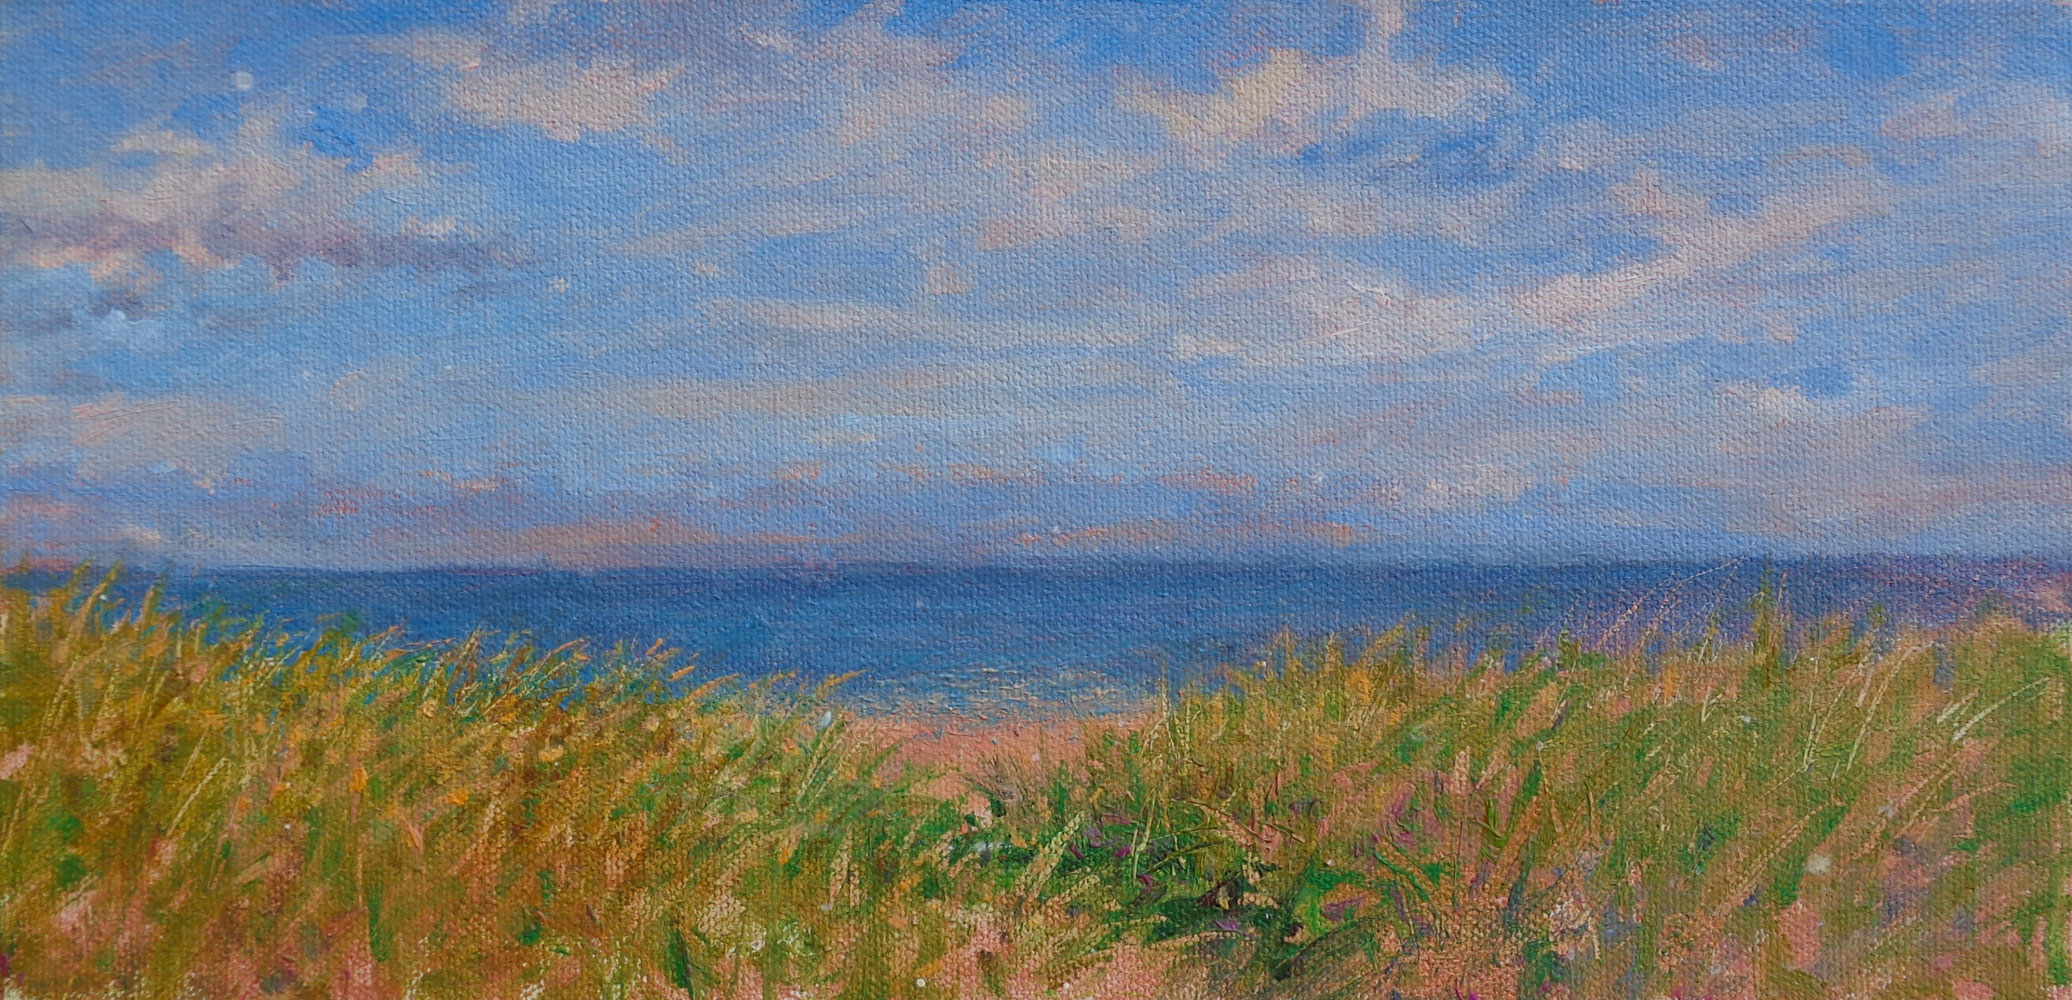 Ocean City Beach and Grass